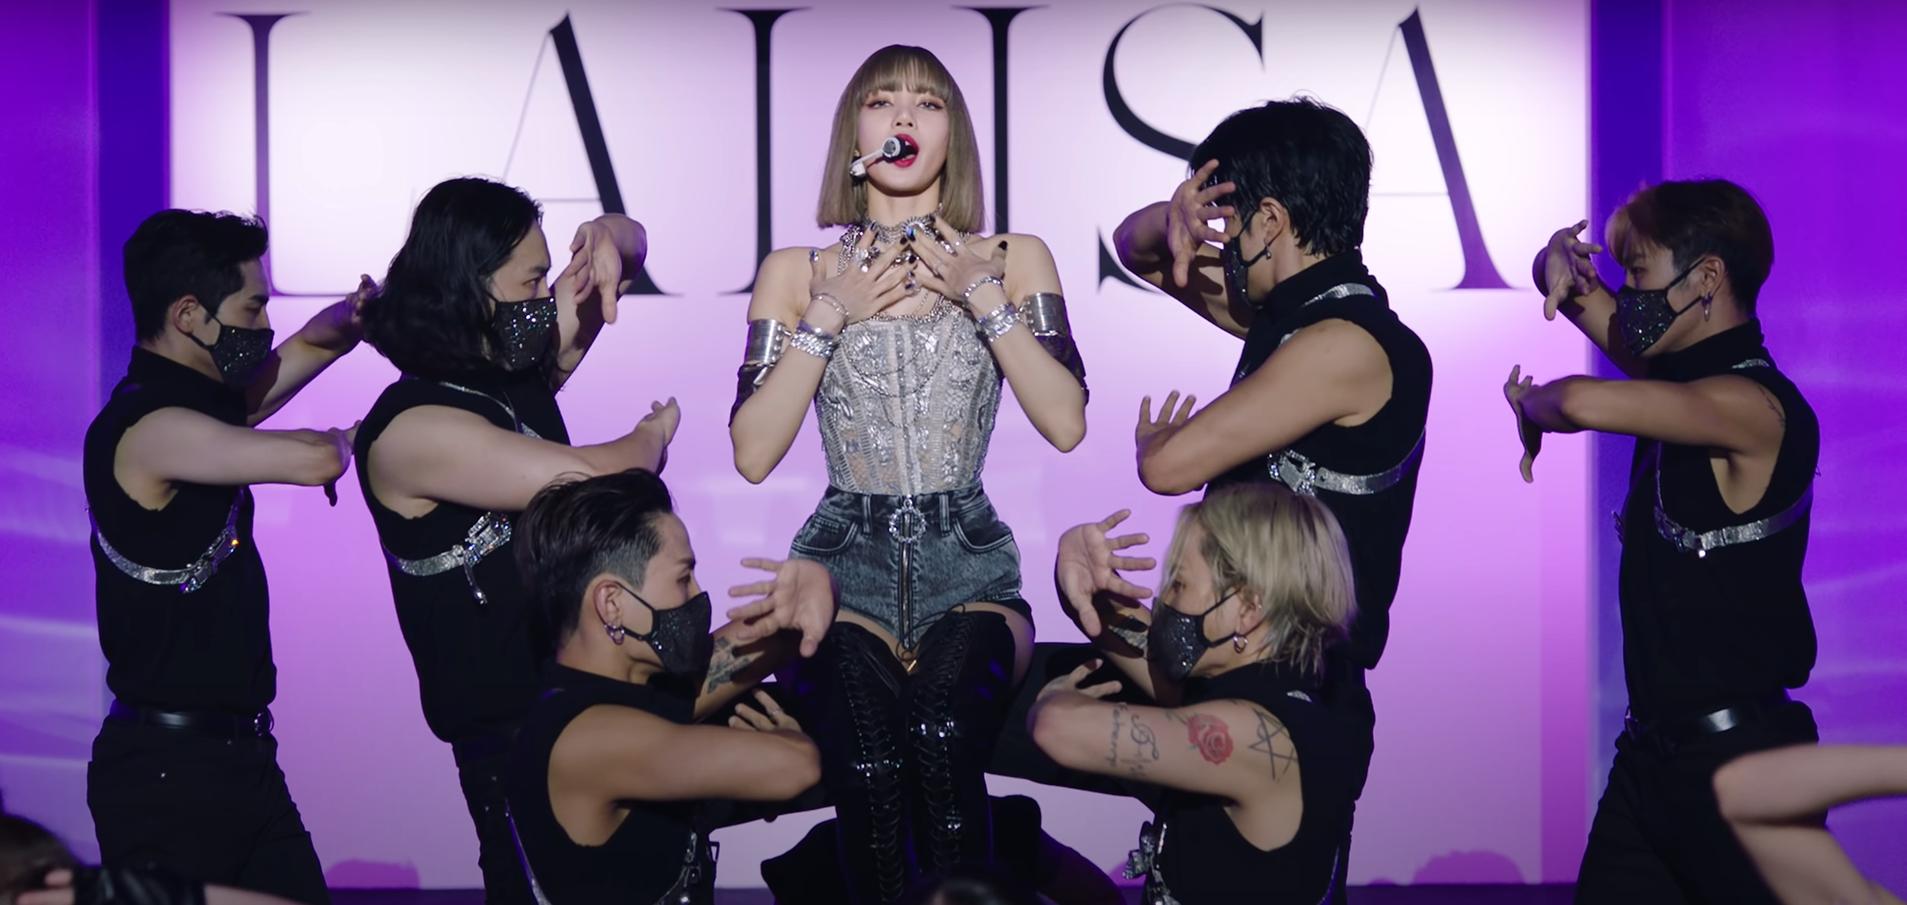 Intip Gaya Kece Lisa BLACKPINK saat Promosi Solo Debut 'Lalisa'